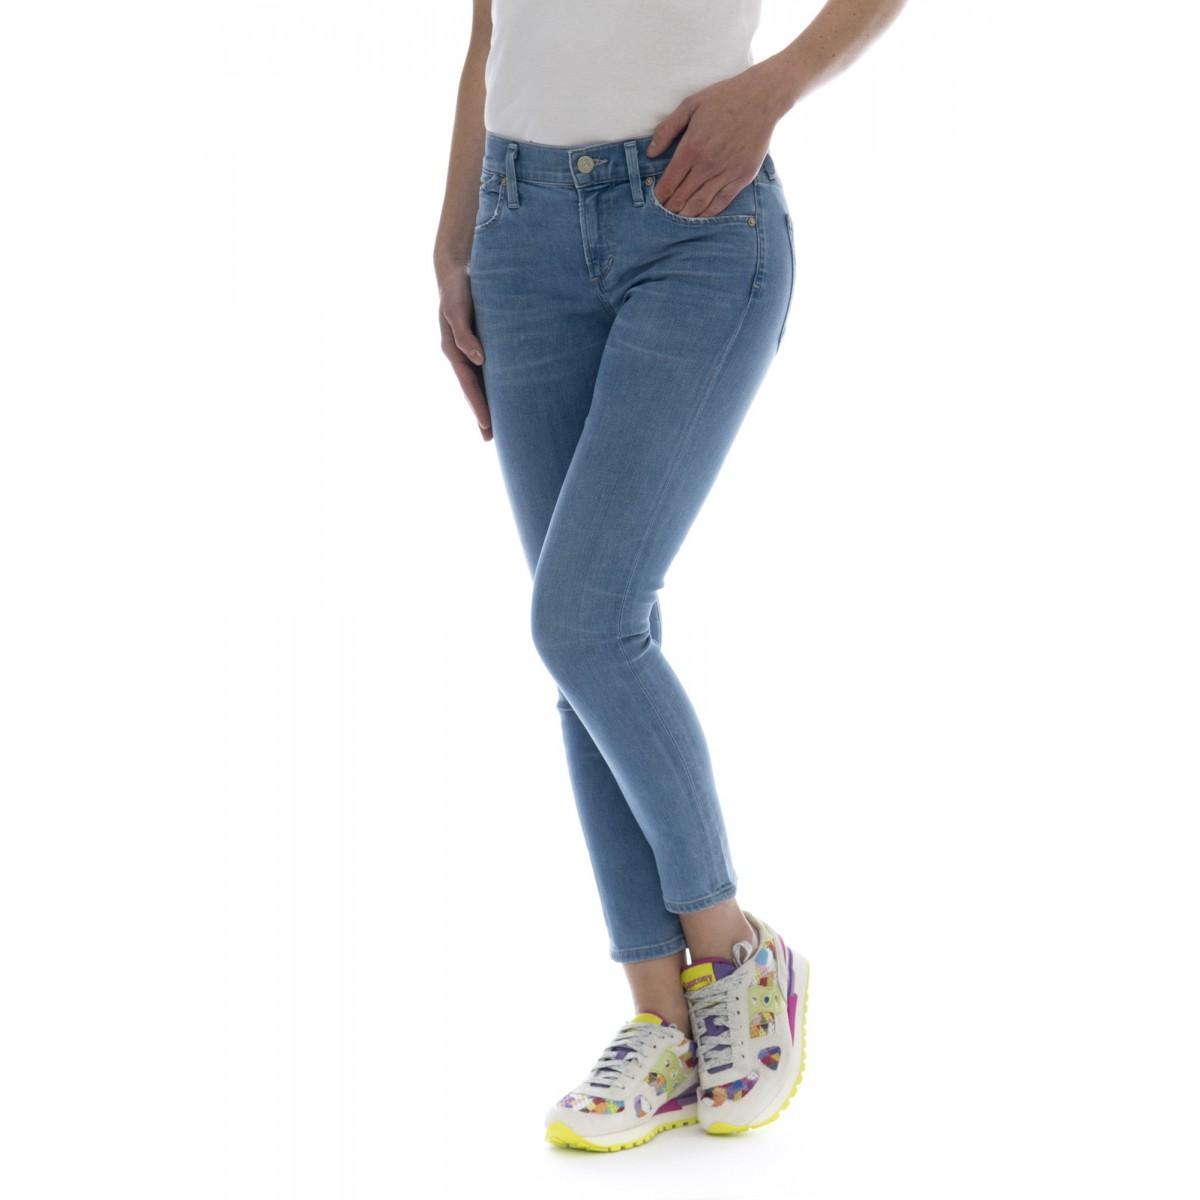 Jeans - Avedon voyage skinny